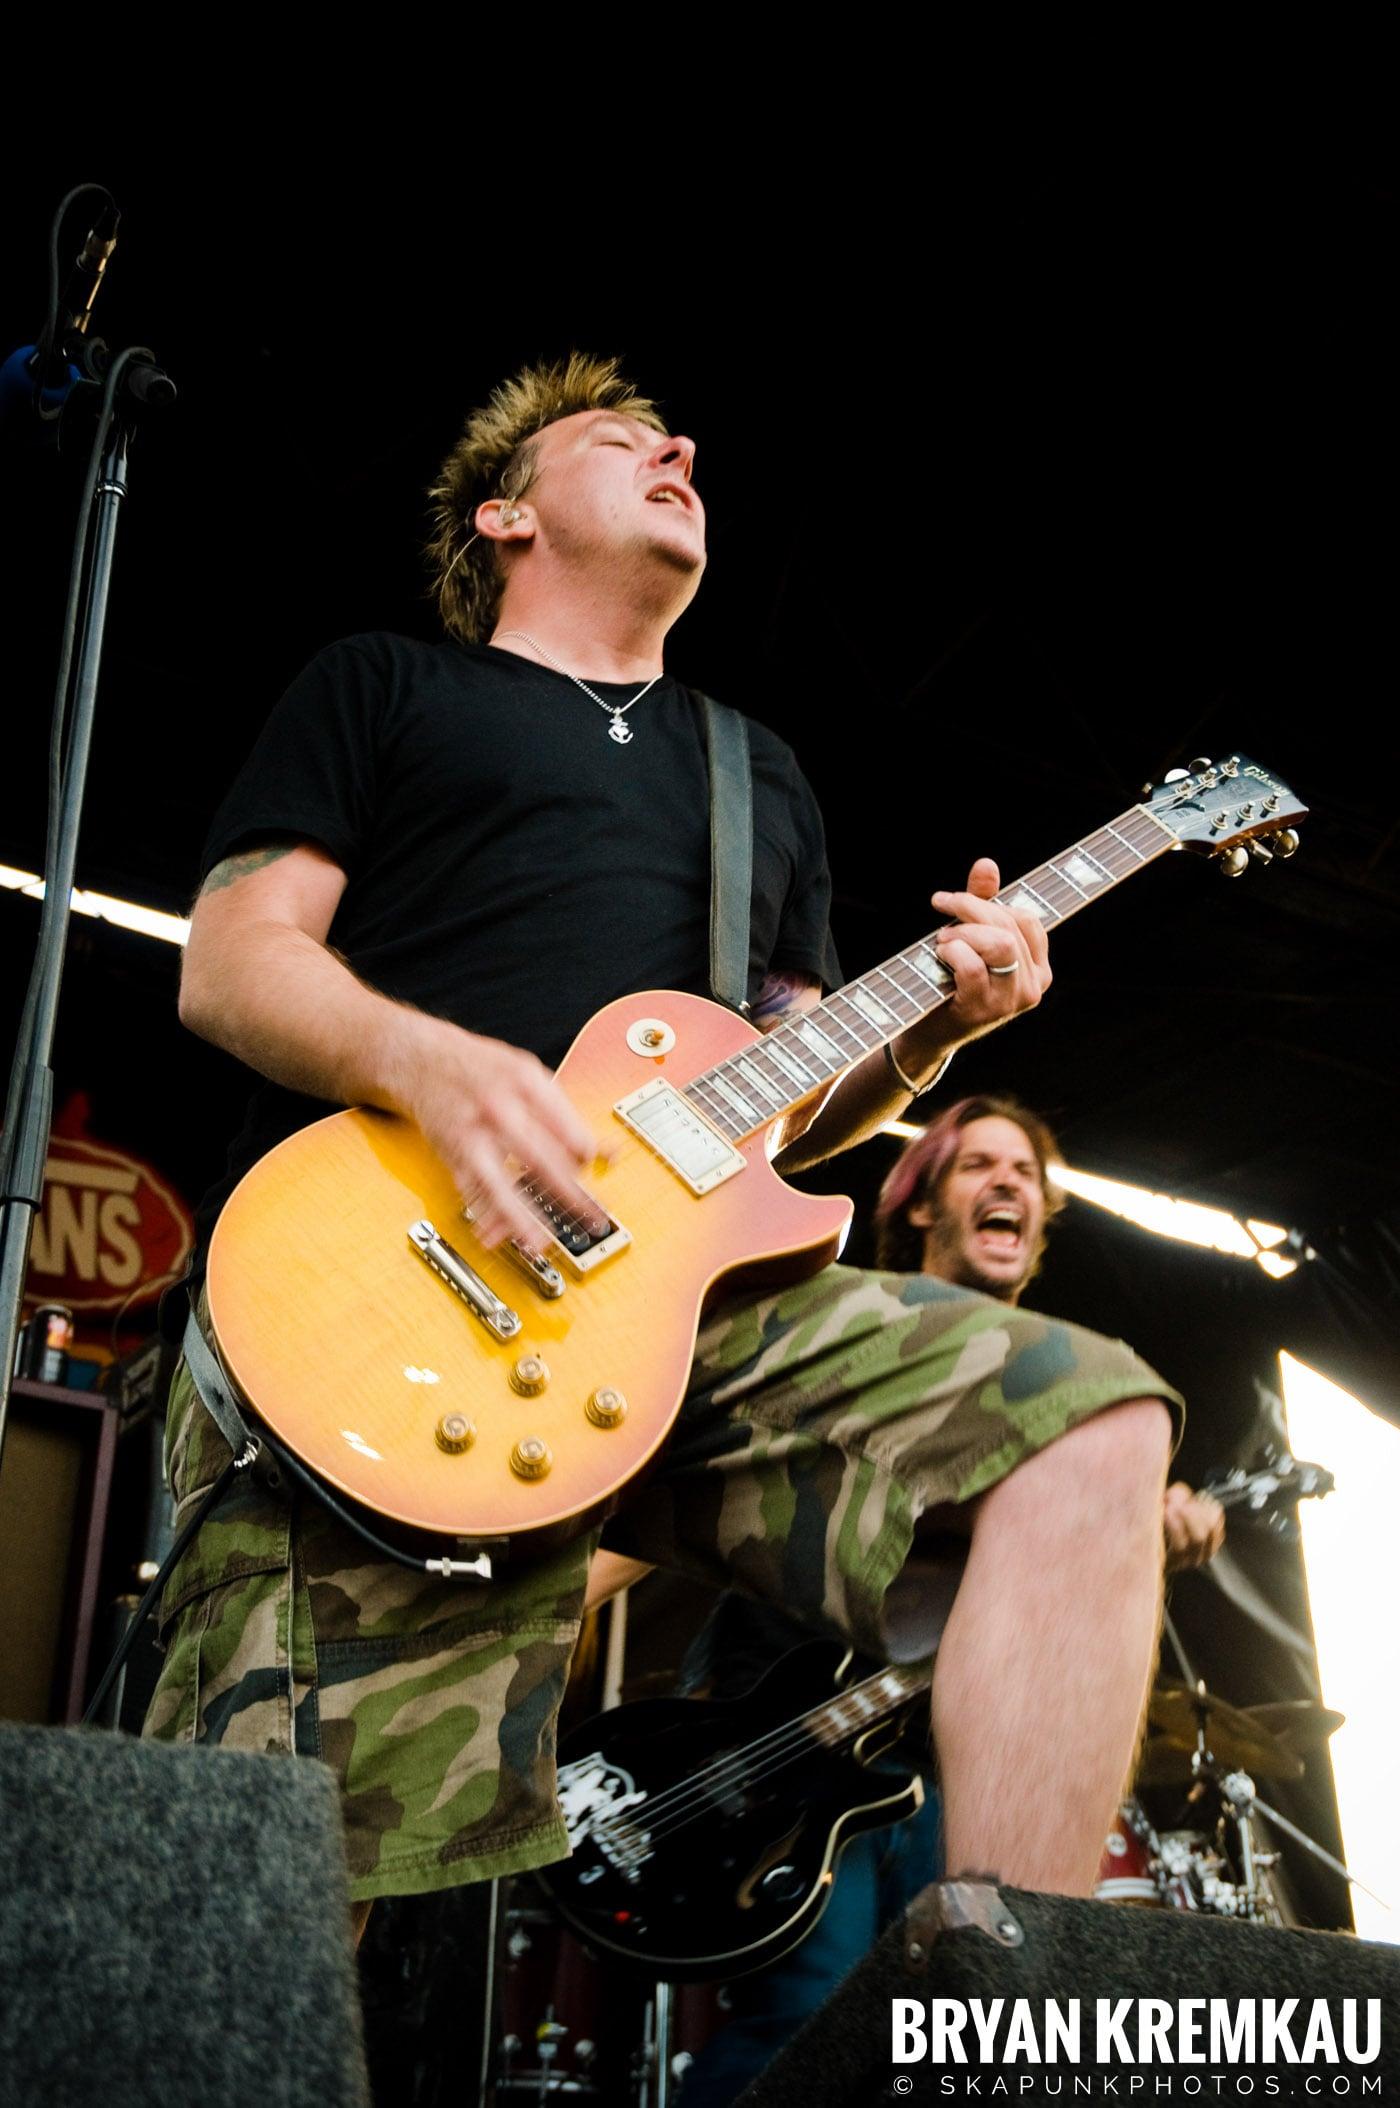 Bad Religion @ Warped Tour 2009, Scranton PA - 07.15.09 (7)